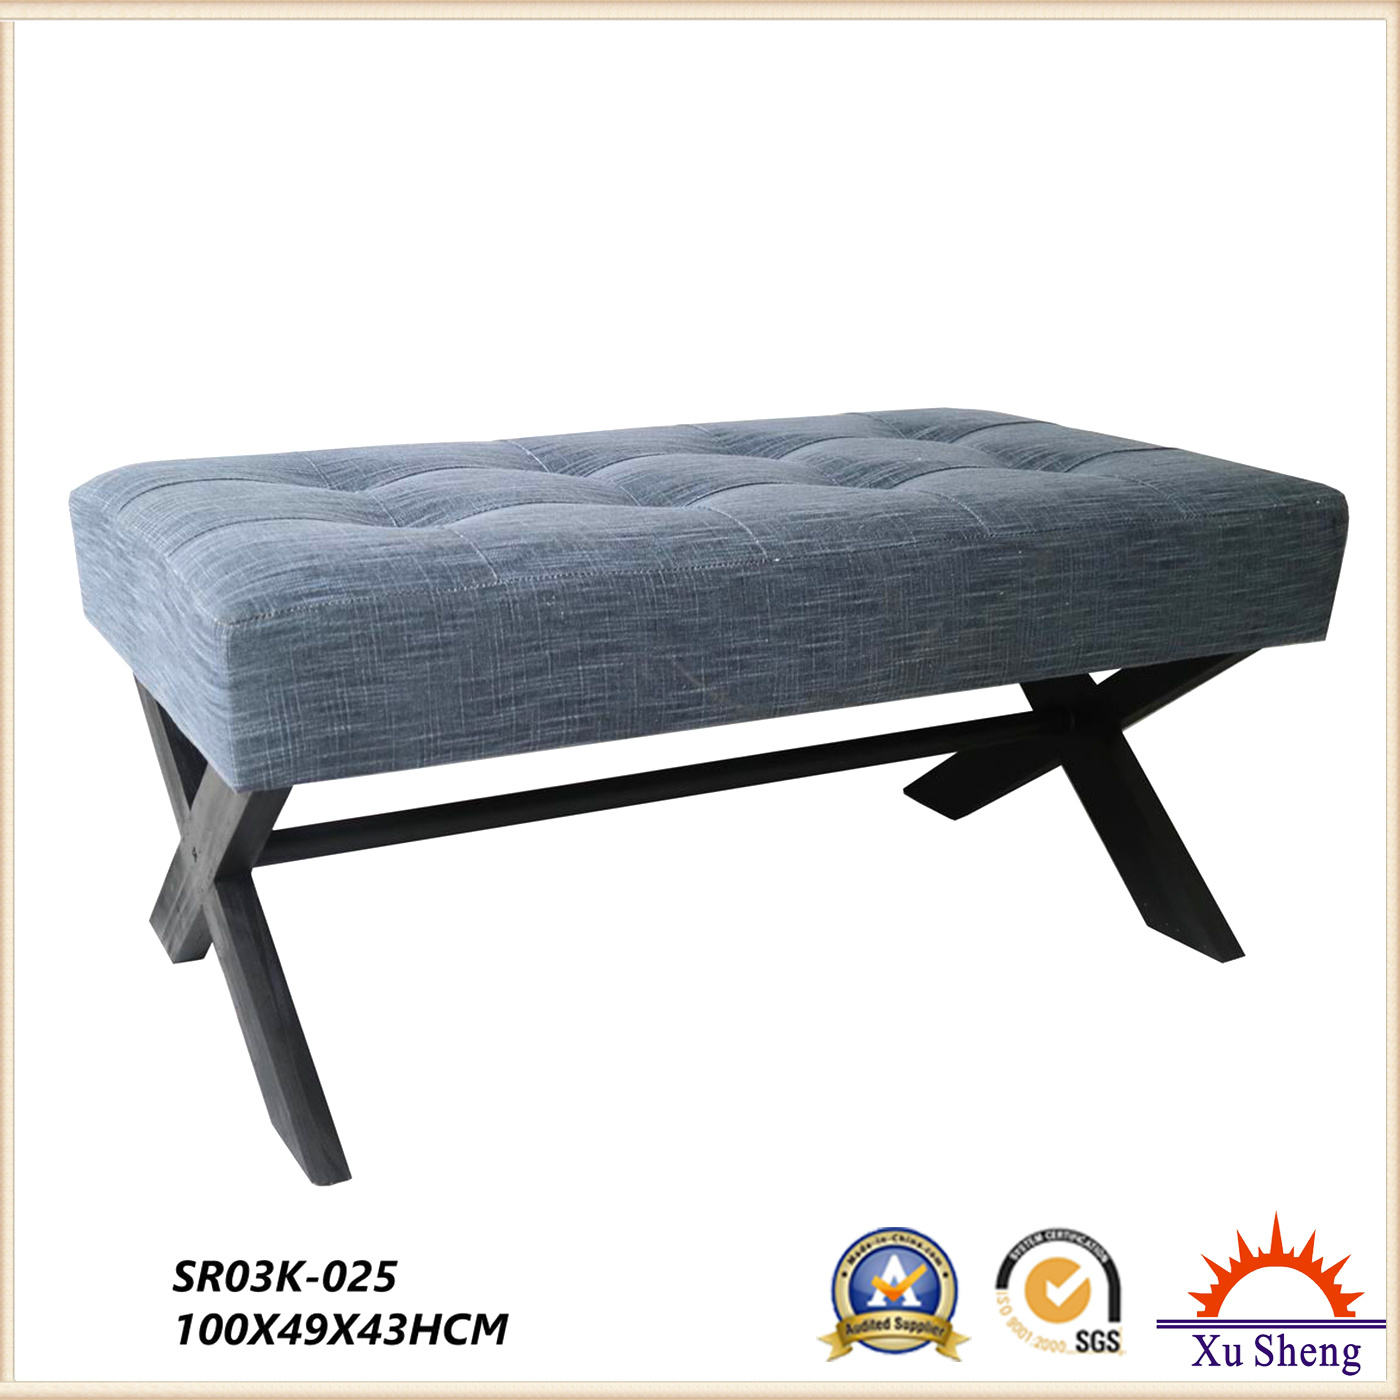 Fabric Modern Contemporary Button Tufted X-Leg Bench